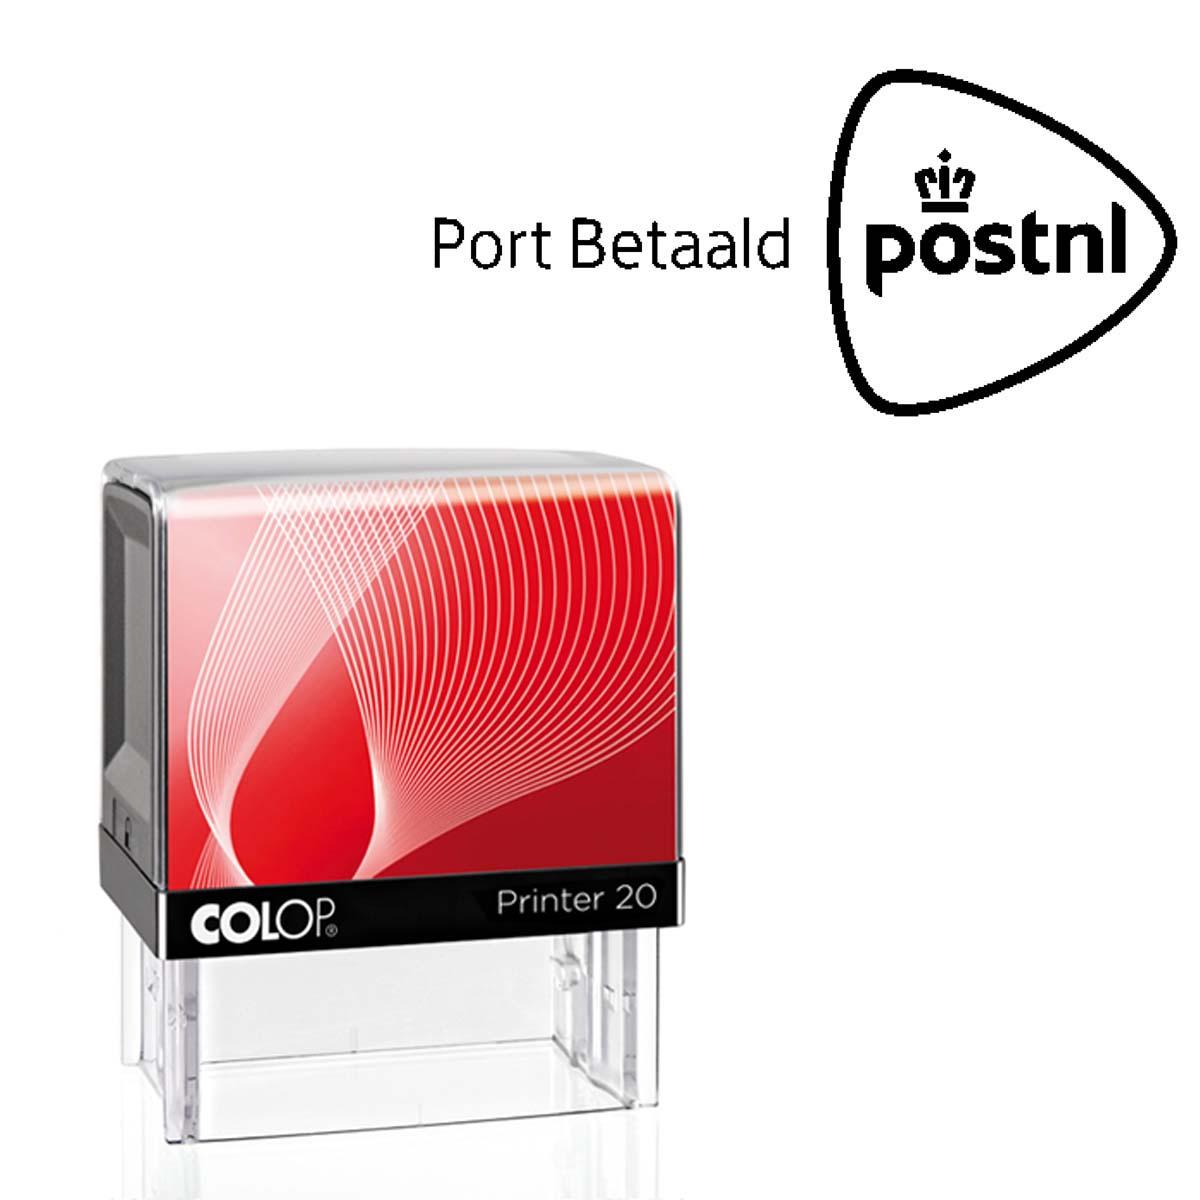 PostNl Port Betaald stempel nationaal. Zelf-inktende Colop stempel